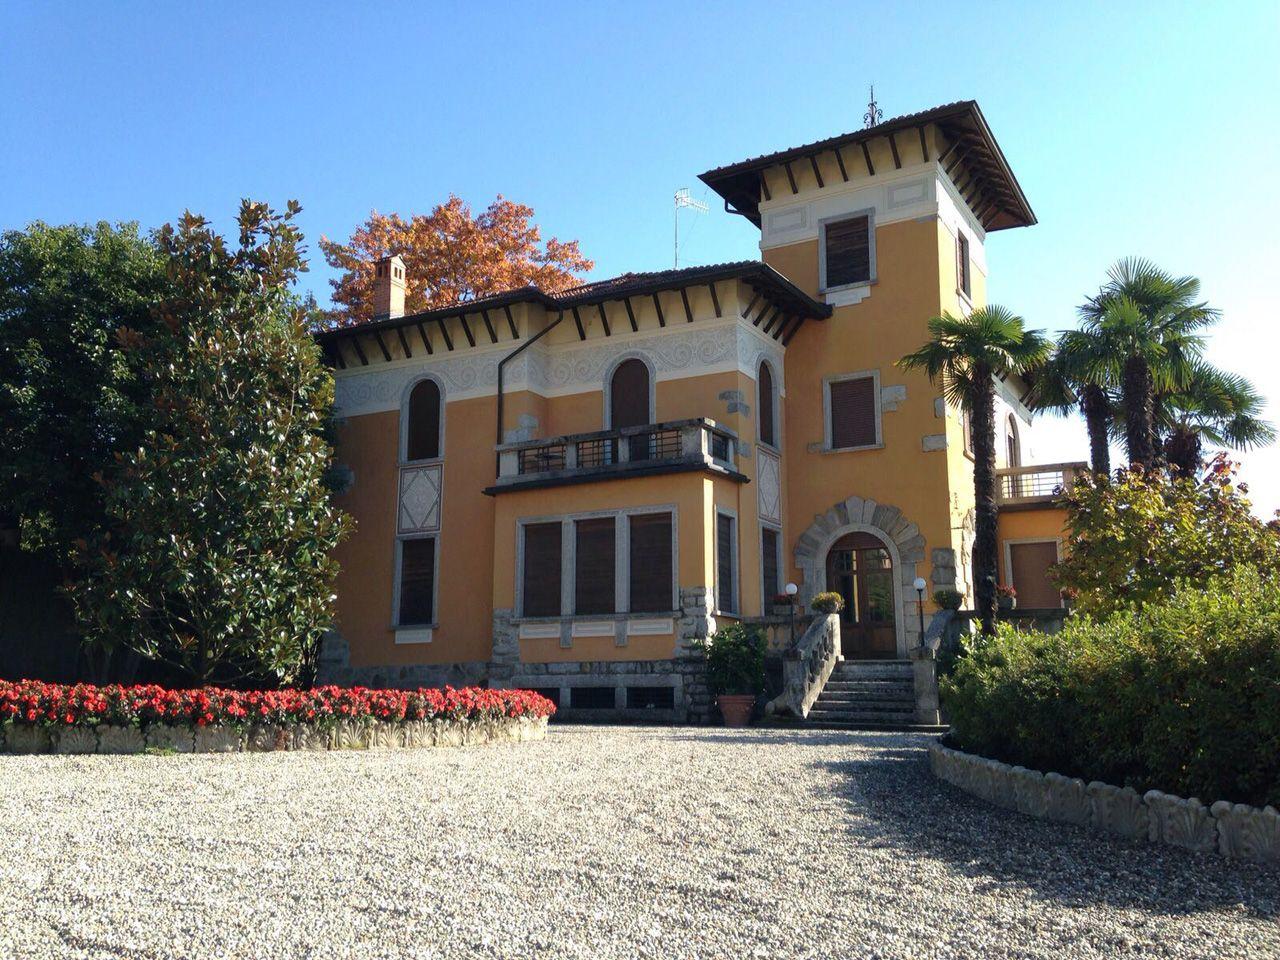 Villa d'epoca a Verbania Biganzolo